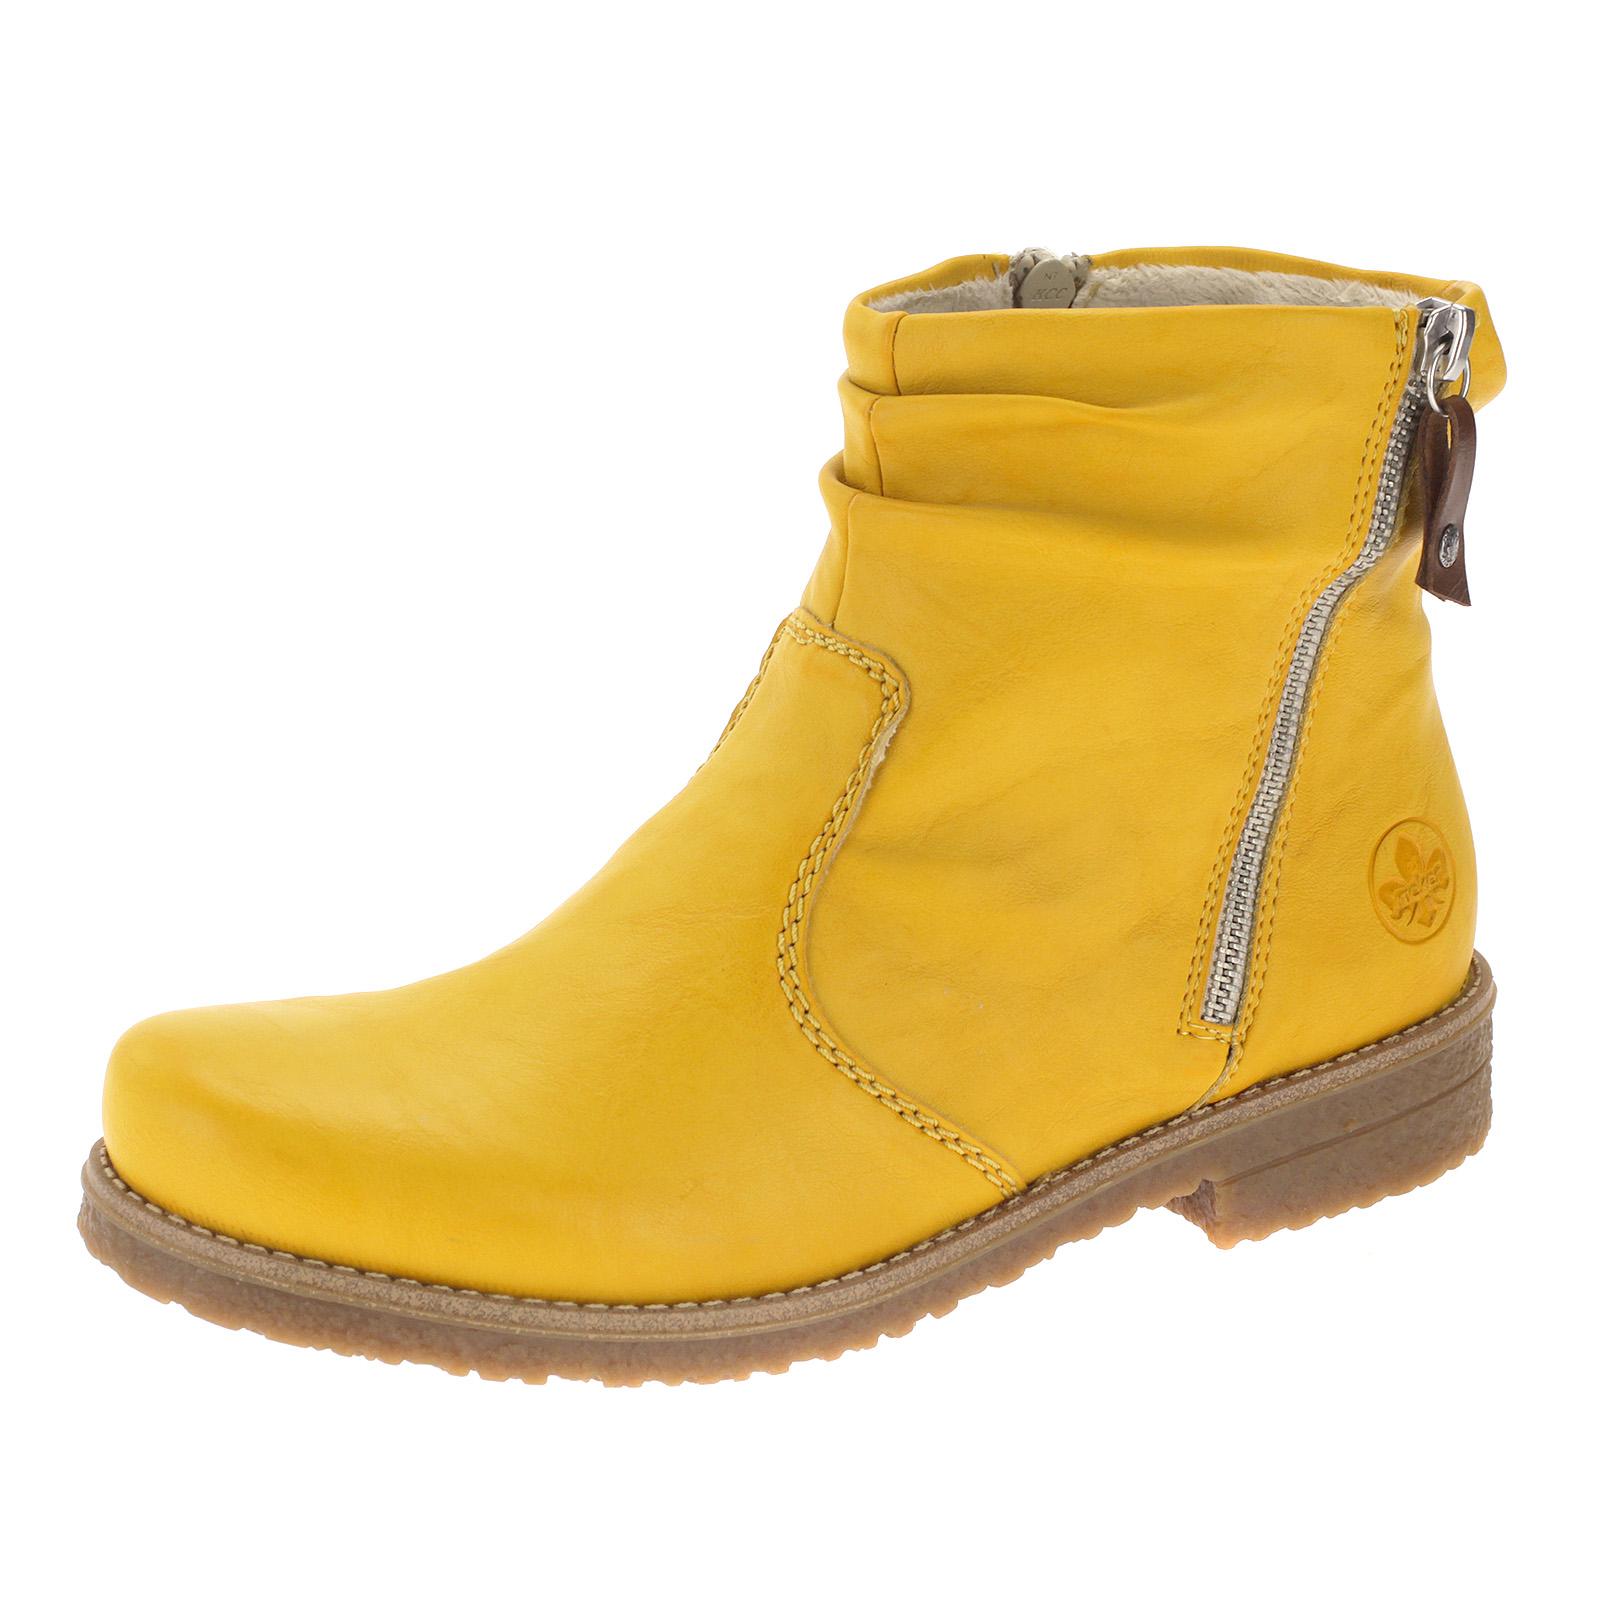 Rieker Damenschuhe Stiefeletten Boots Stiefel Warmfutter Booty Gelb 73561-69